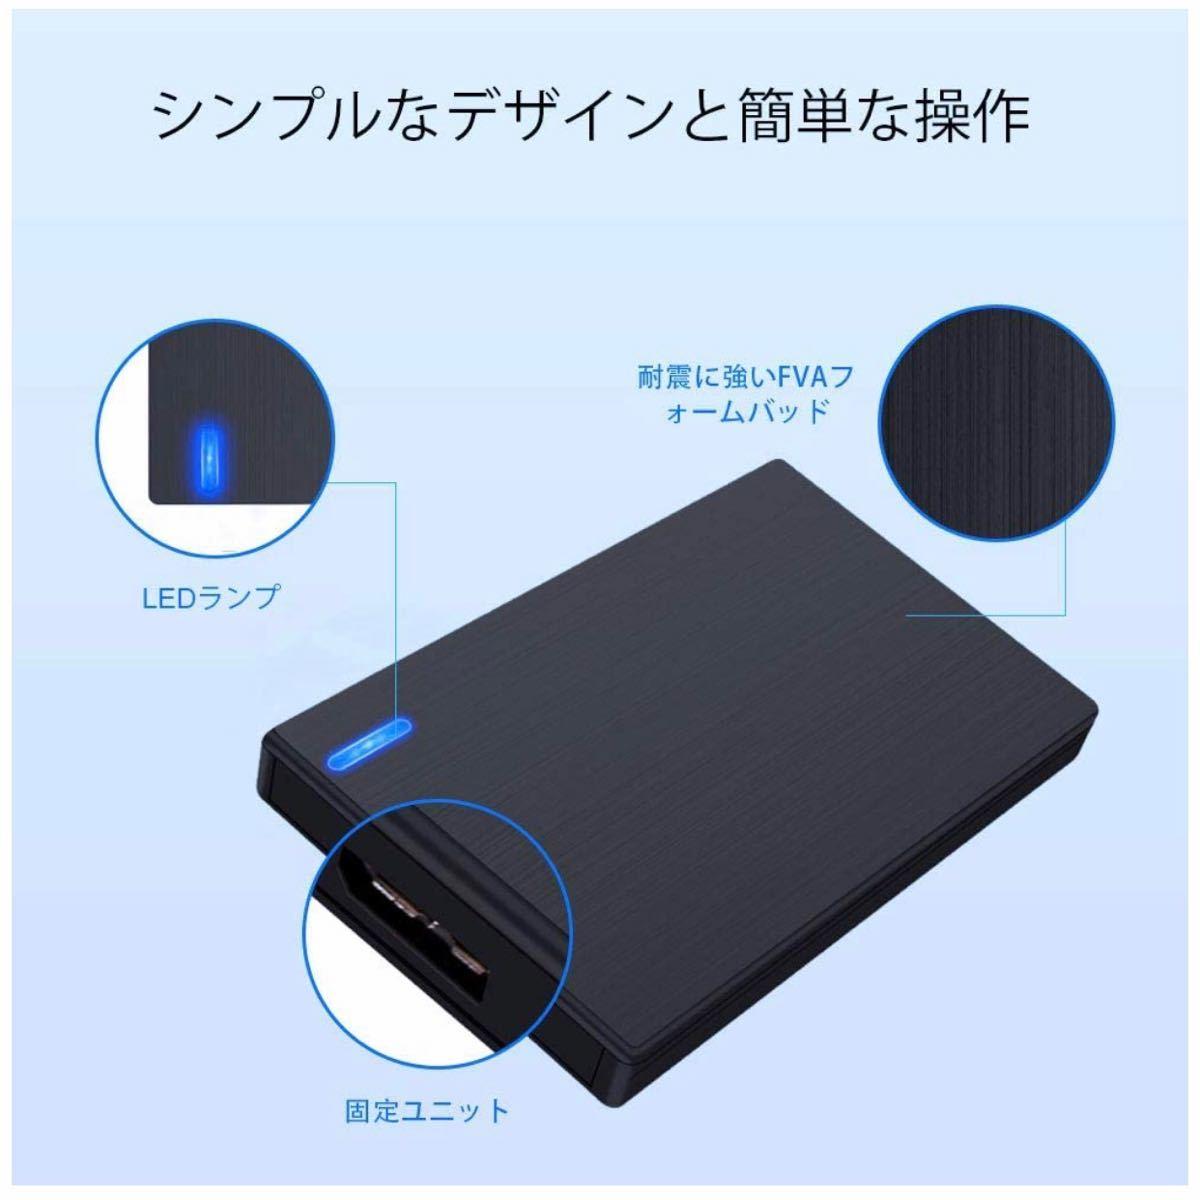 USB3.0 小型 外付ポータブルハードディスク 外付けHDD 160GB  補助電源不要